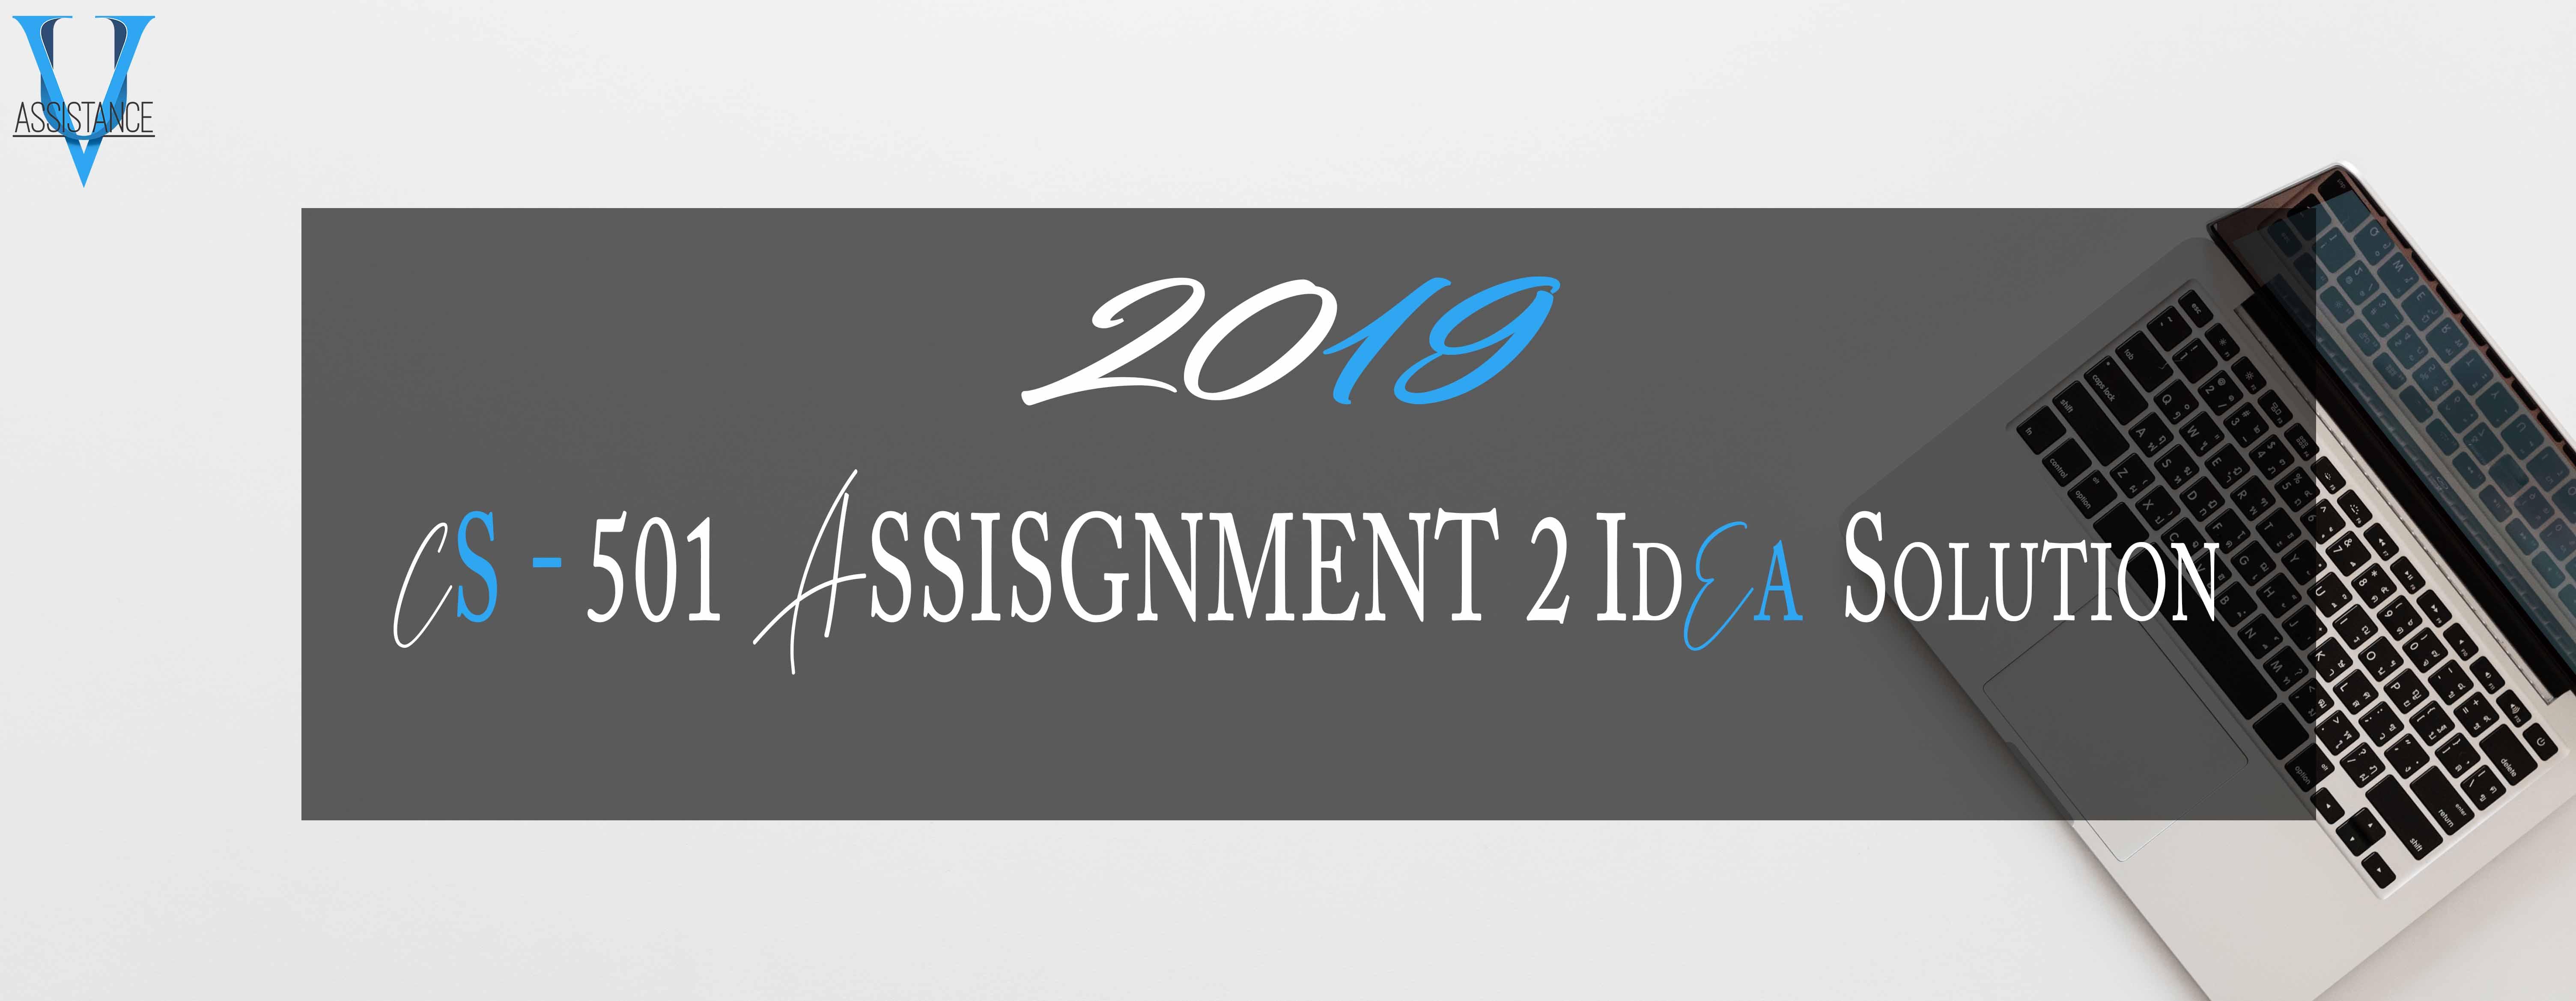 Cs501 Assisgnment 2 idea solution 2019